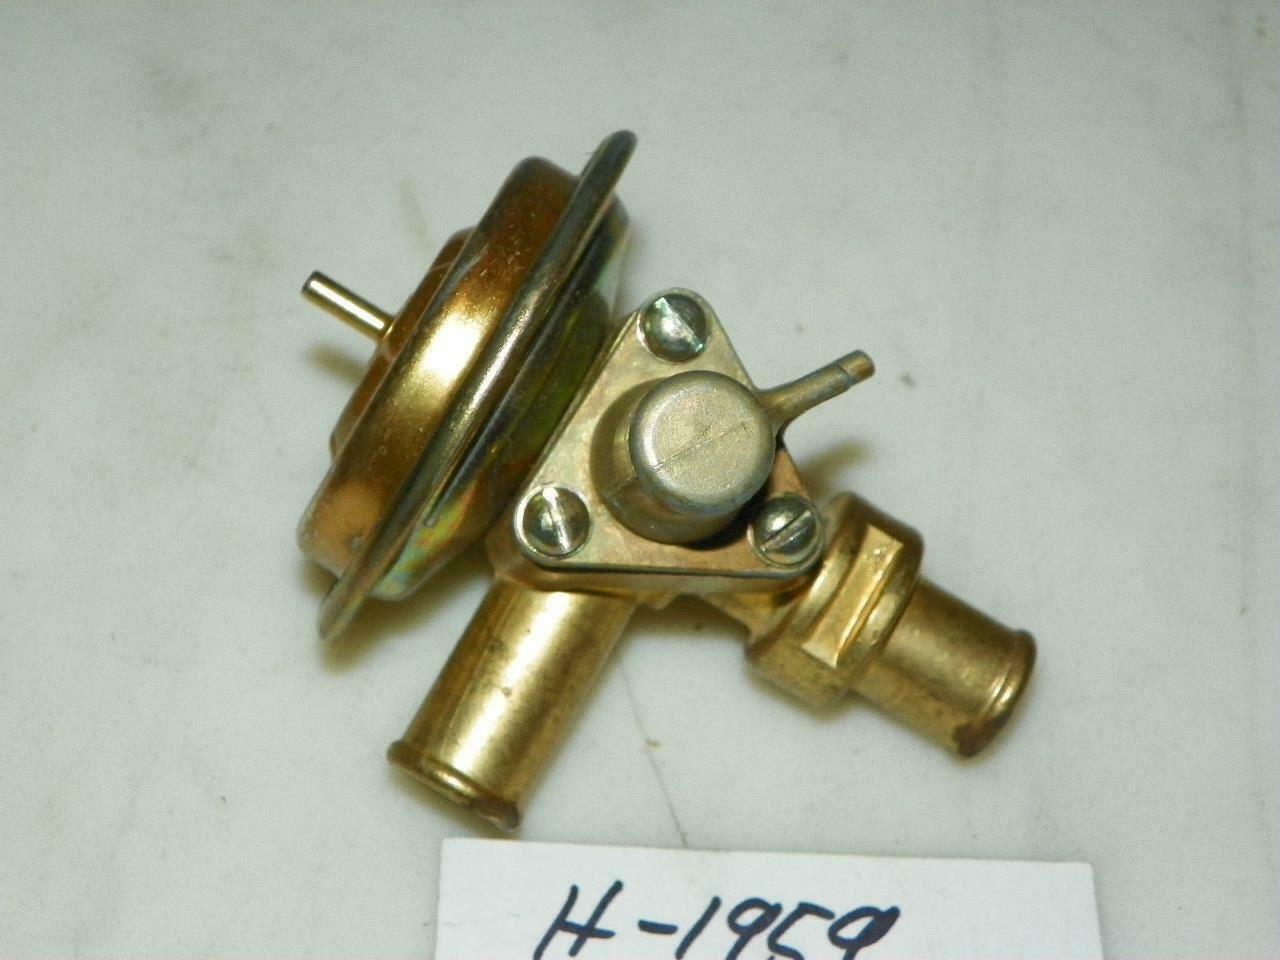 Buick 1969 -1970 NOS Heater Control Valve w/ Sensing  Unit H1959 OEM 1230573